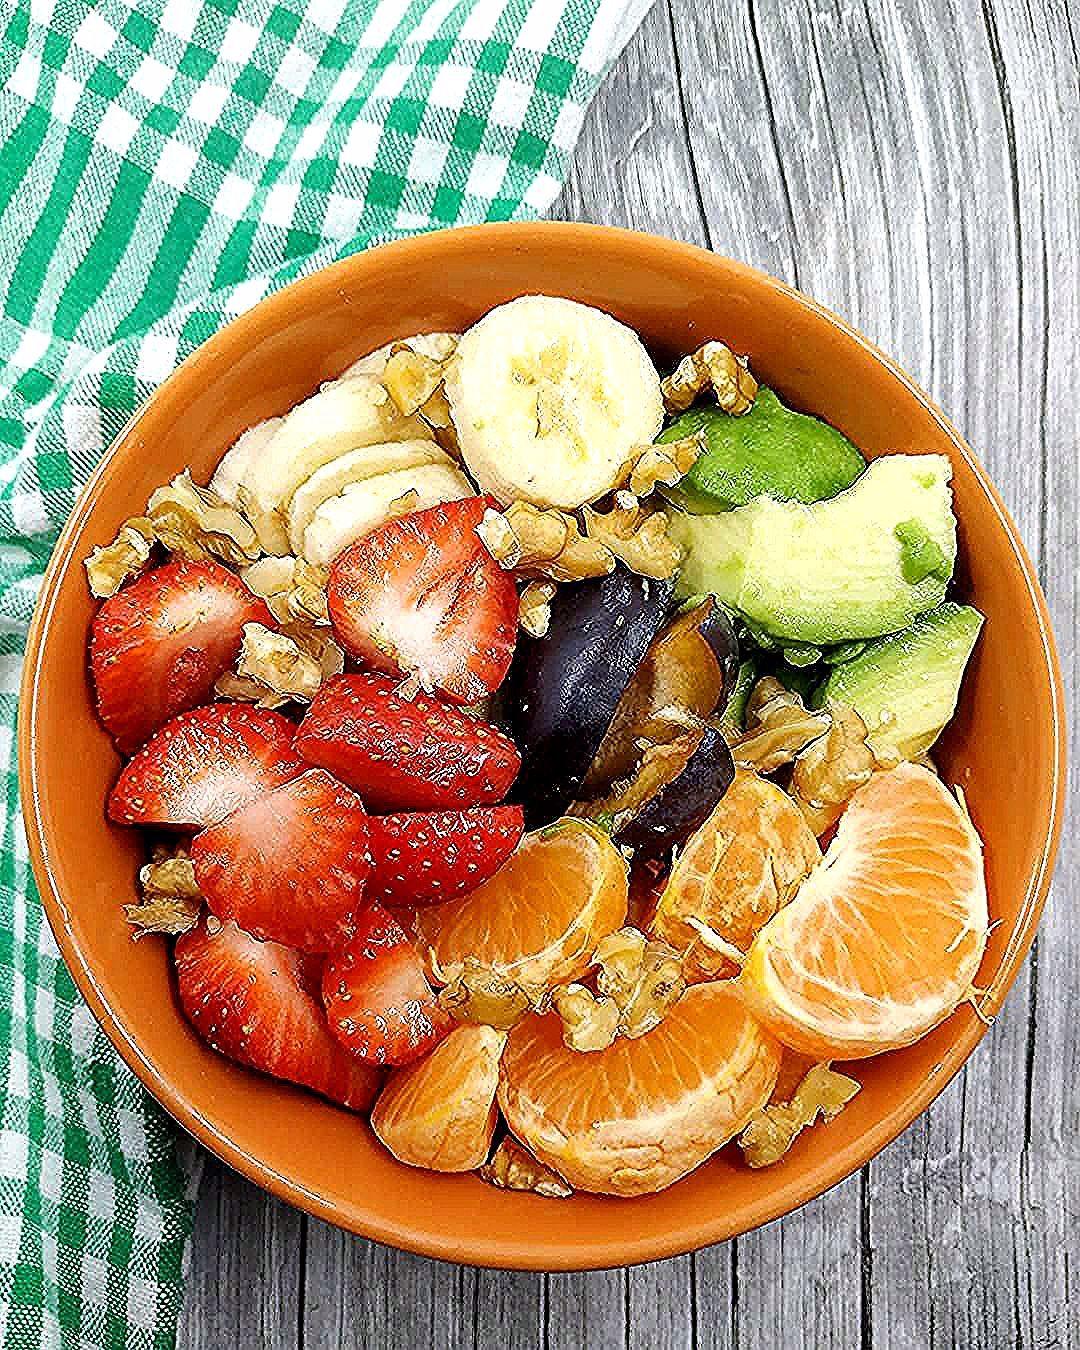 Good morning 🙋🏻♀️ 🇬🇧 #breakfast #oatsforbreakfast #oatmealbowl #fruitslover #fitnessmotivation #foodislove #foodishappiness #fooddiary #healthymeals #healthyanddelicious #neverskipbreakfast #eatingbetter #choosinghealthier 🇭🇷 #dobrojutro #doručak #zobenepahuljice #voće #nepreskačidoručak #idejazaobrok #motivacija #zdravakuhinja #biramzdravije 🇩🇪 #gutenmorgen #frühstück #haferflockenbrei #obst #gesundundlecker #schmecktgut #gesundeküche #gesunderezepte